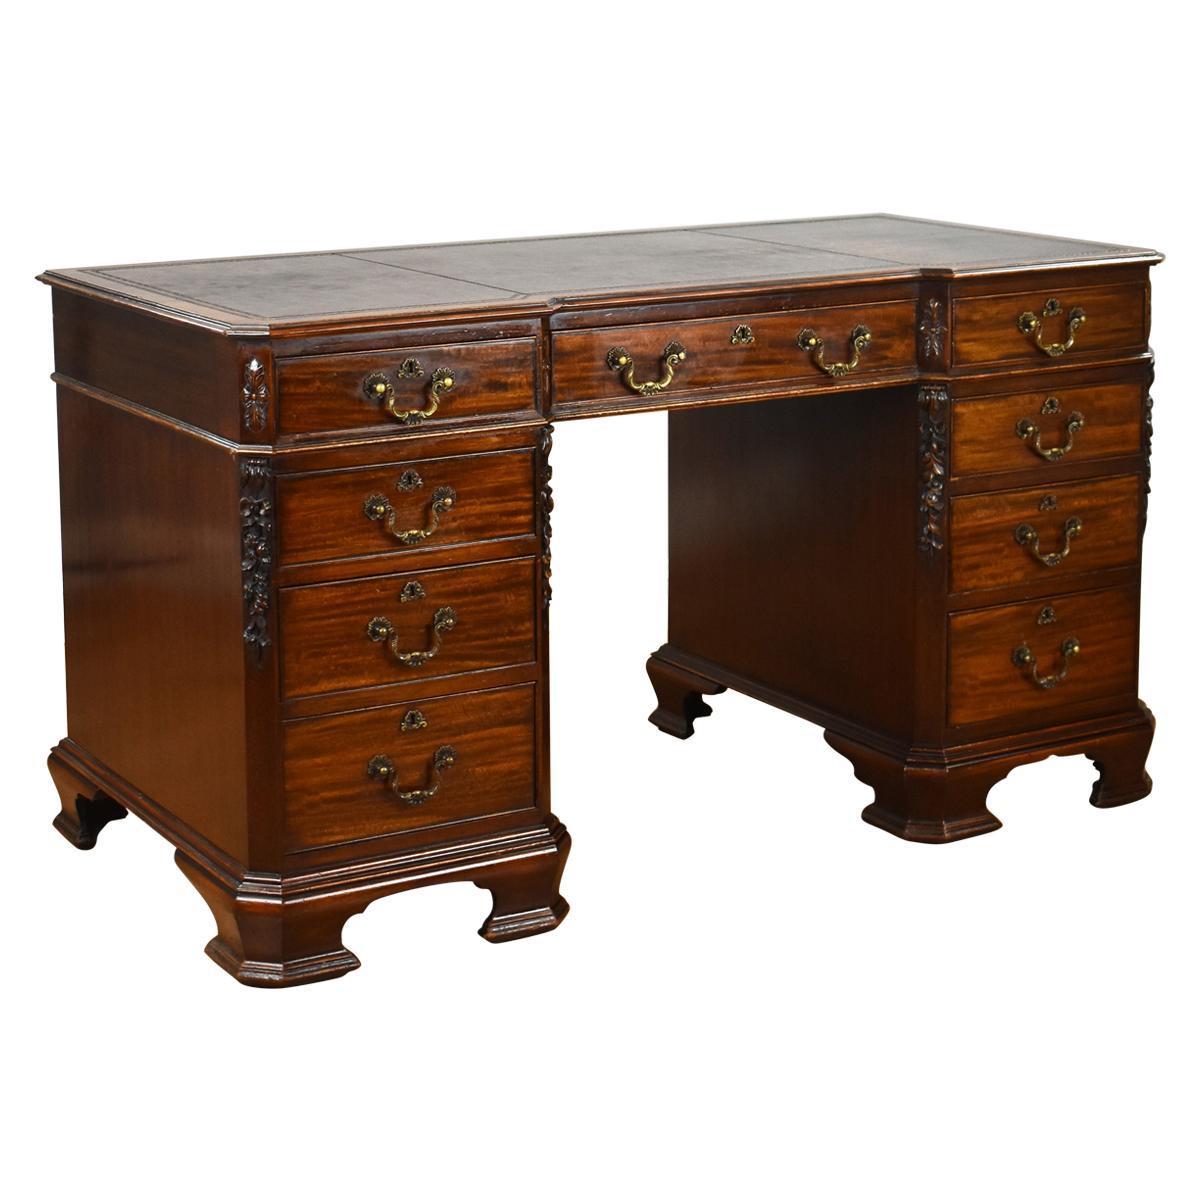 19th Century English Chippendale Style Pedestal Desk